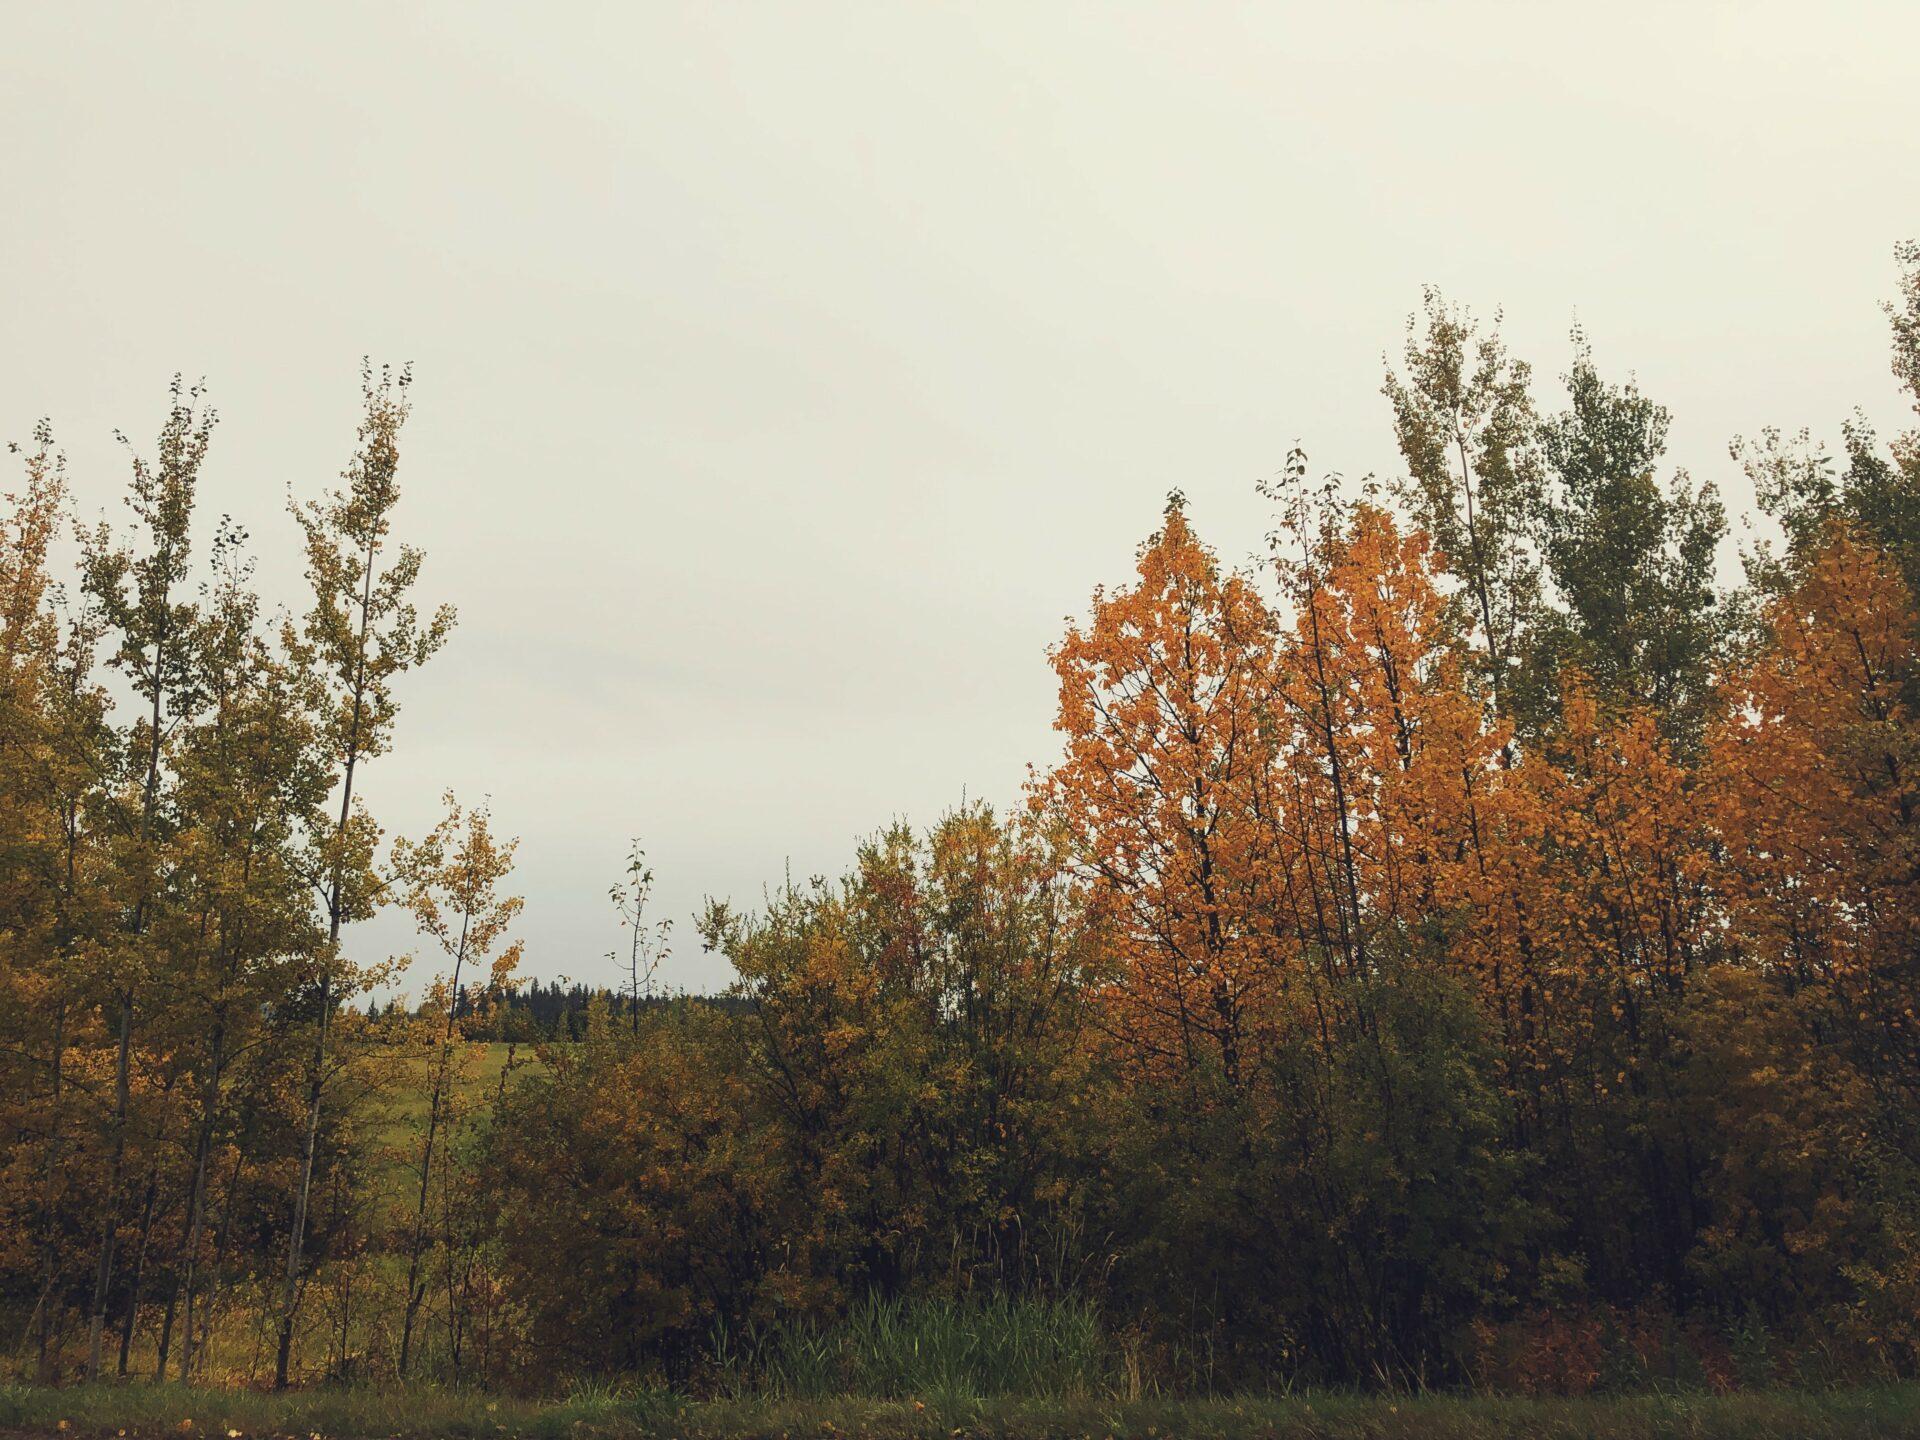 Foraged Tea On A Foggy Fall Morning. Credit: Raeanne O'Meara.